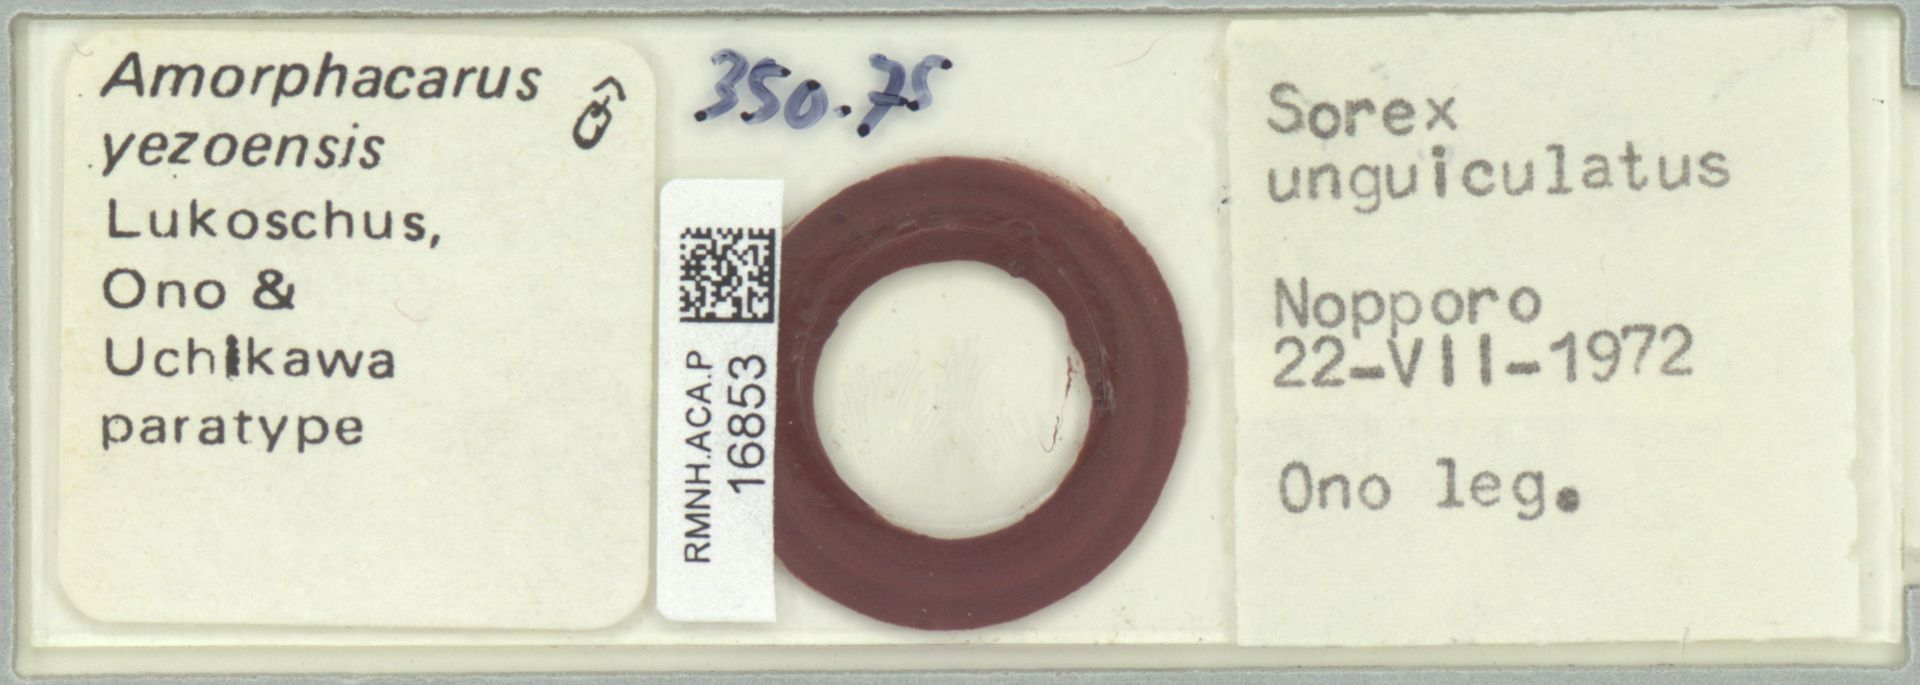 RMNH.ACA.P.16853 | Amorphacarus yezoensis Lukoschus